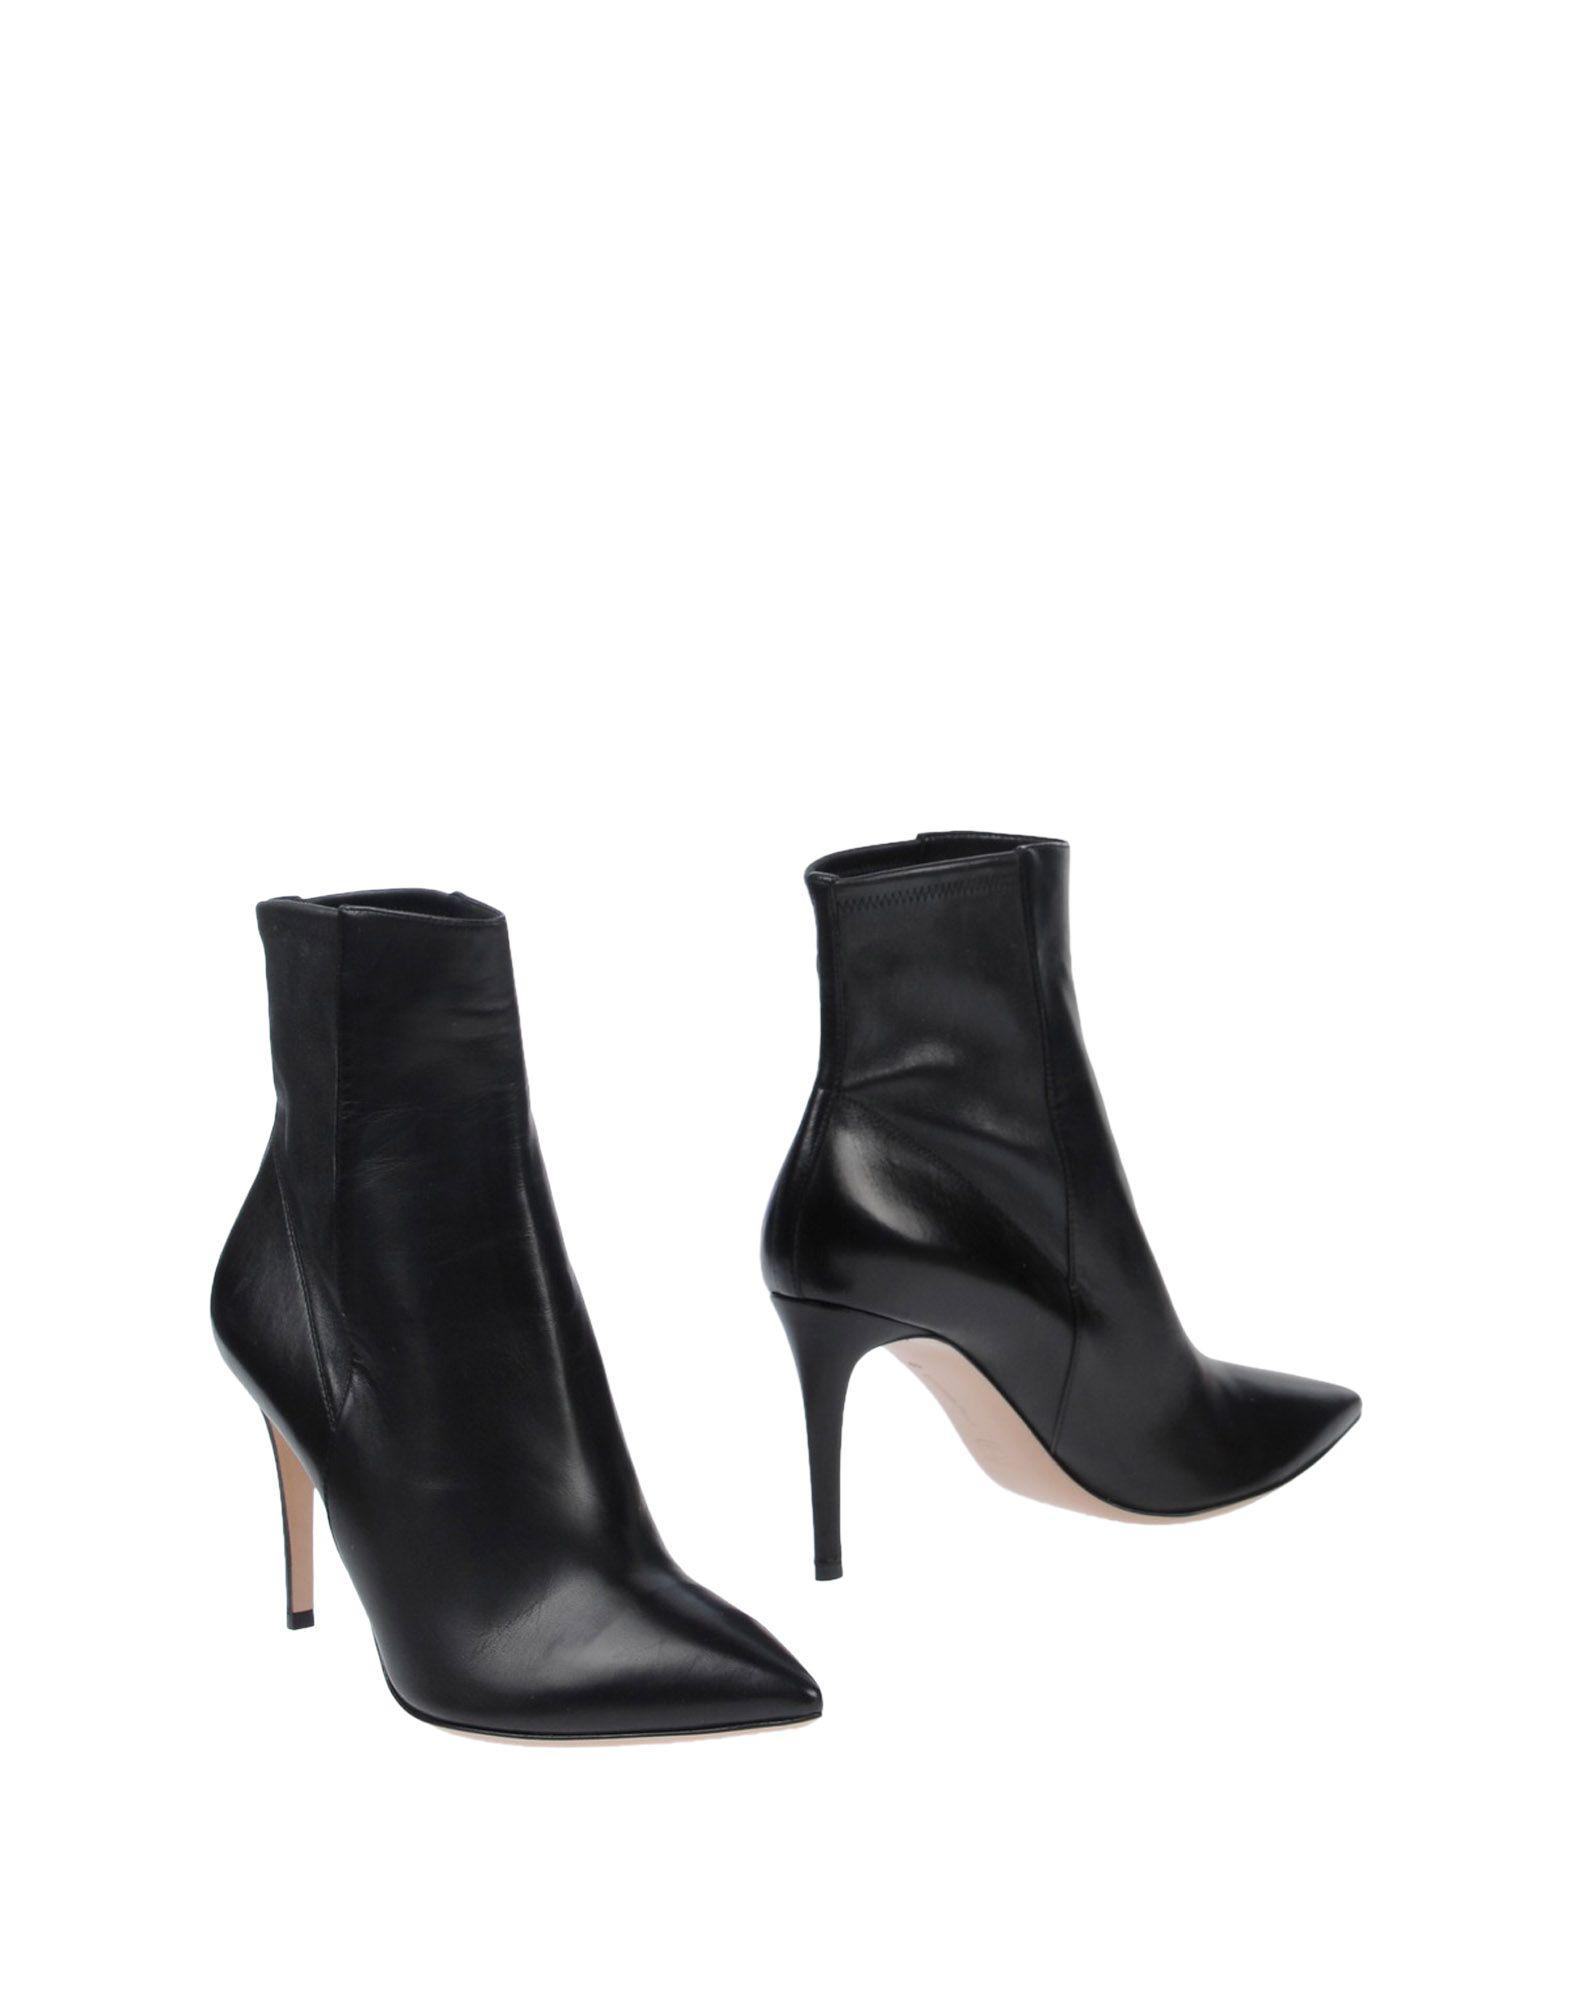 Gianvito Rossi Stiefelette 11498107XL Damen  11498107XL Stiefelette Neue Schuhe 88659d